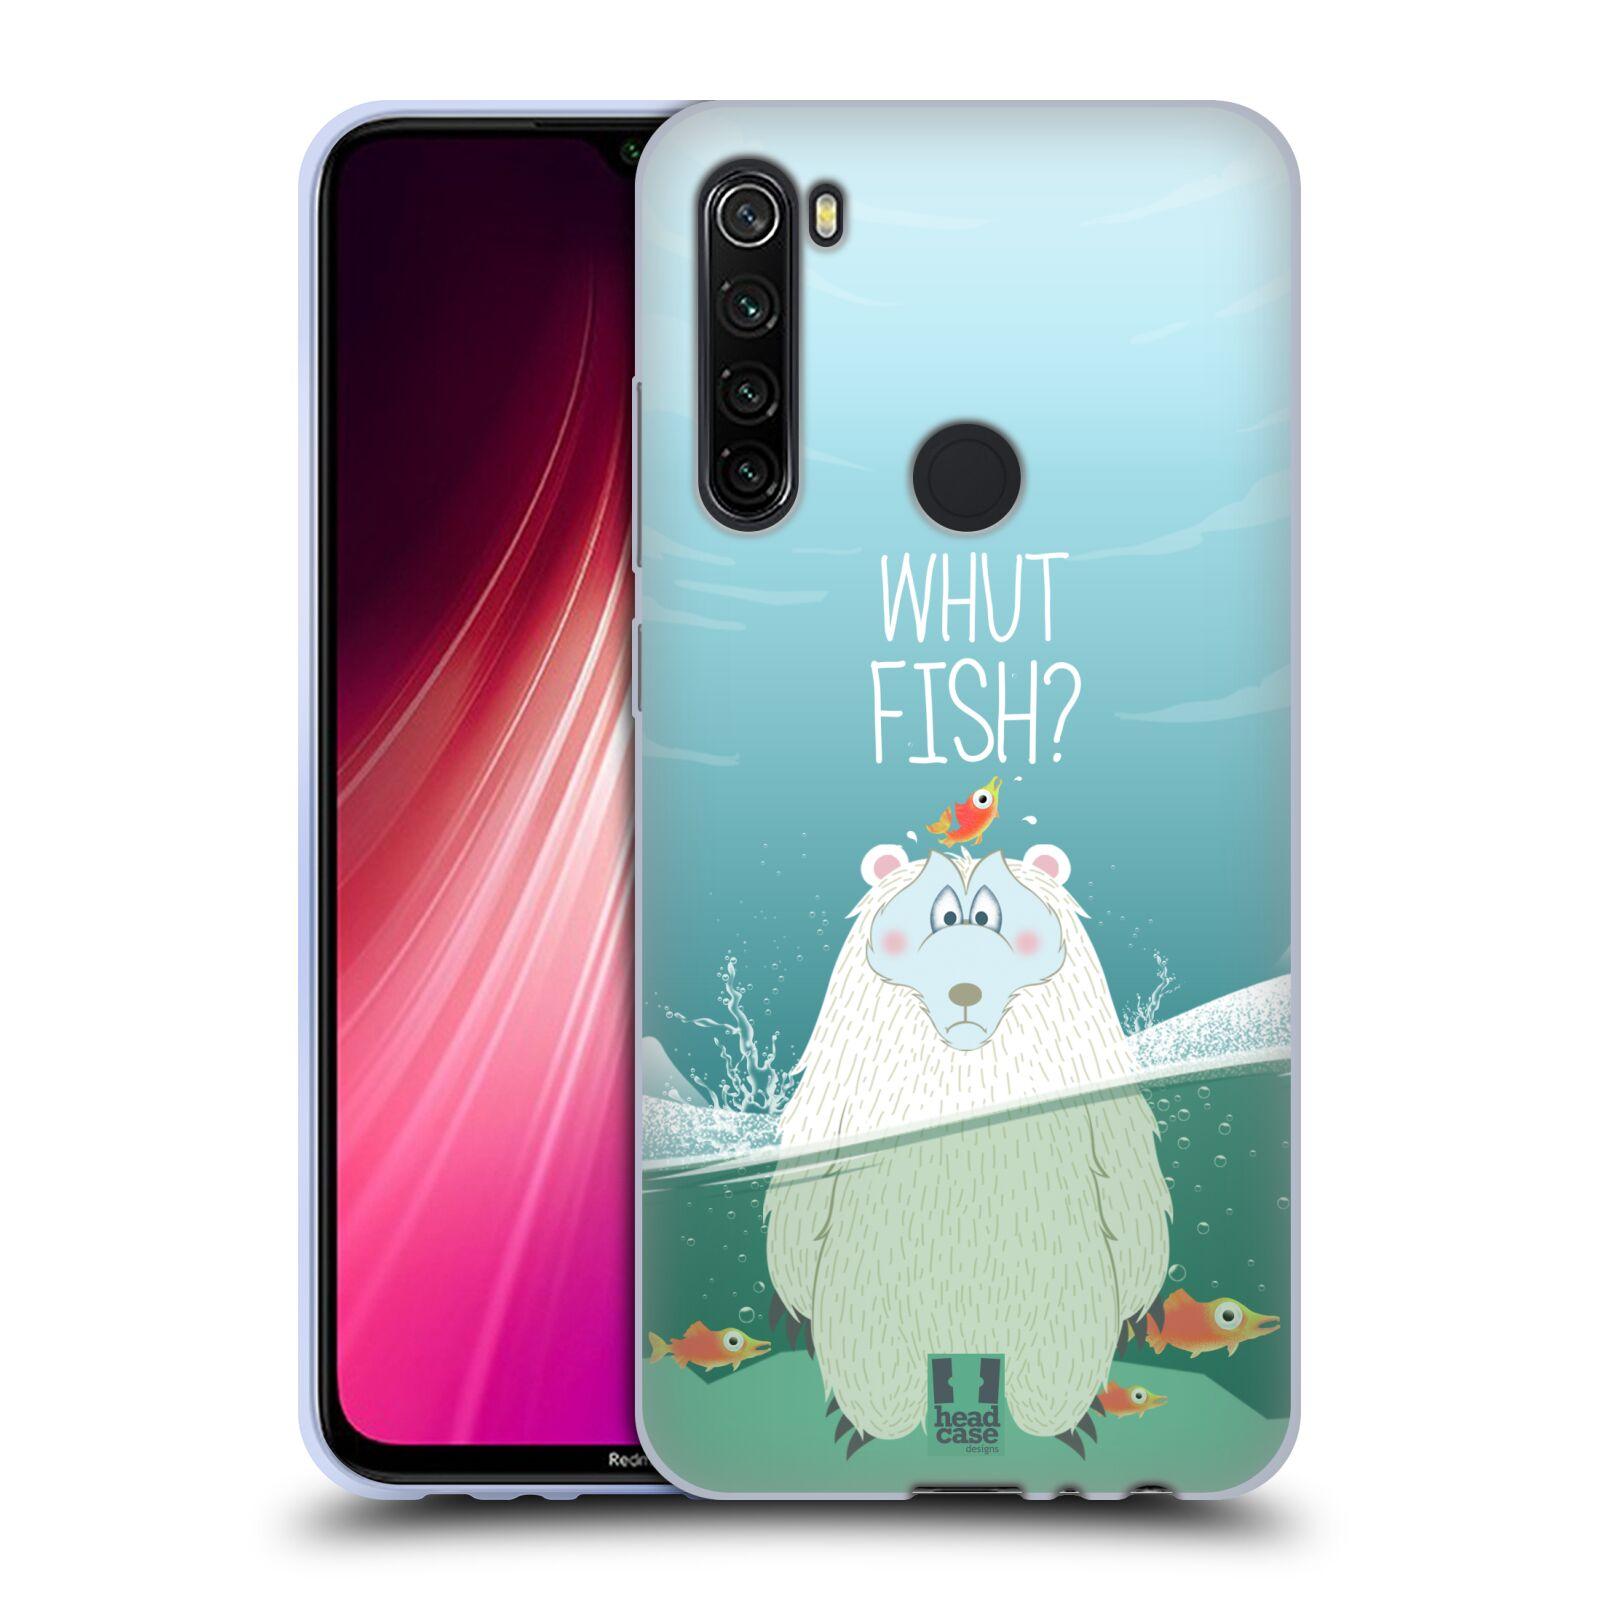 Silikonové pouzdro na mobil Xiaomi Redmi Note 8T - Head Case - Medvěd Whut Fish?